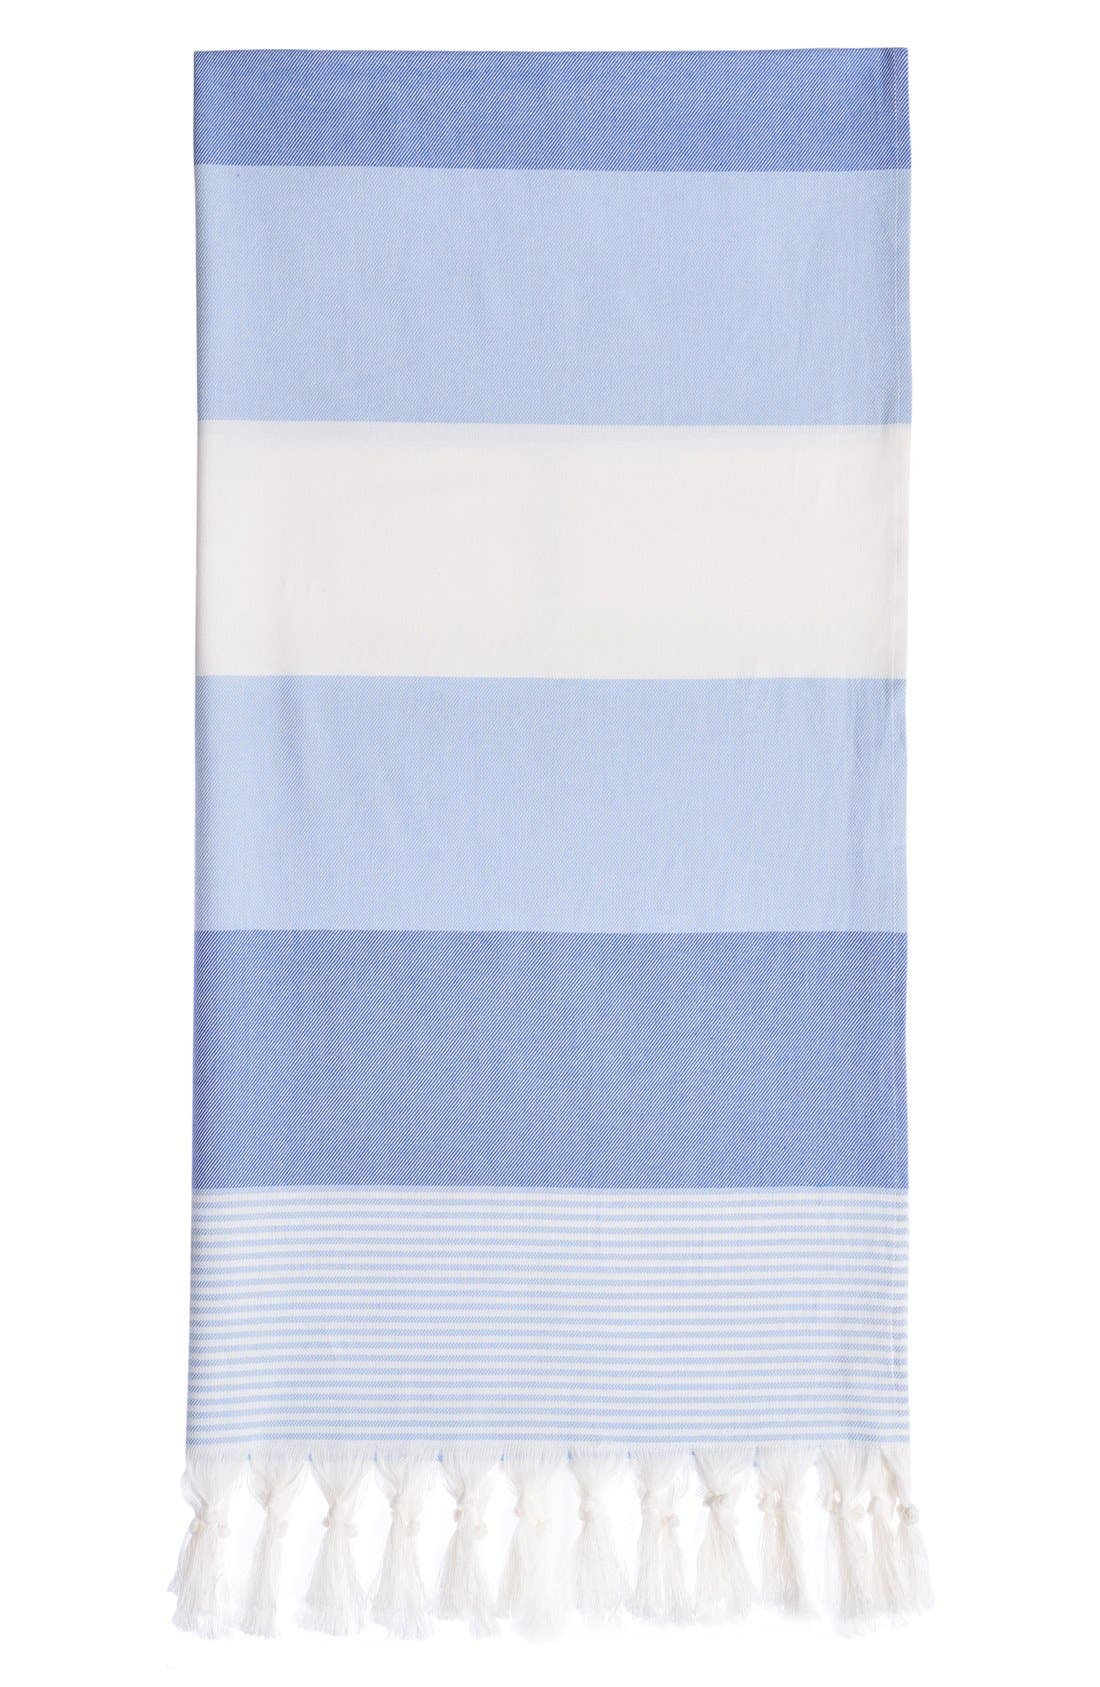 'Sea Waves' Turkish Pestemal Towel,                             Main thumbnail 1, color,                             400